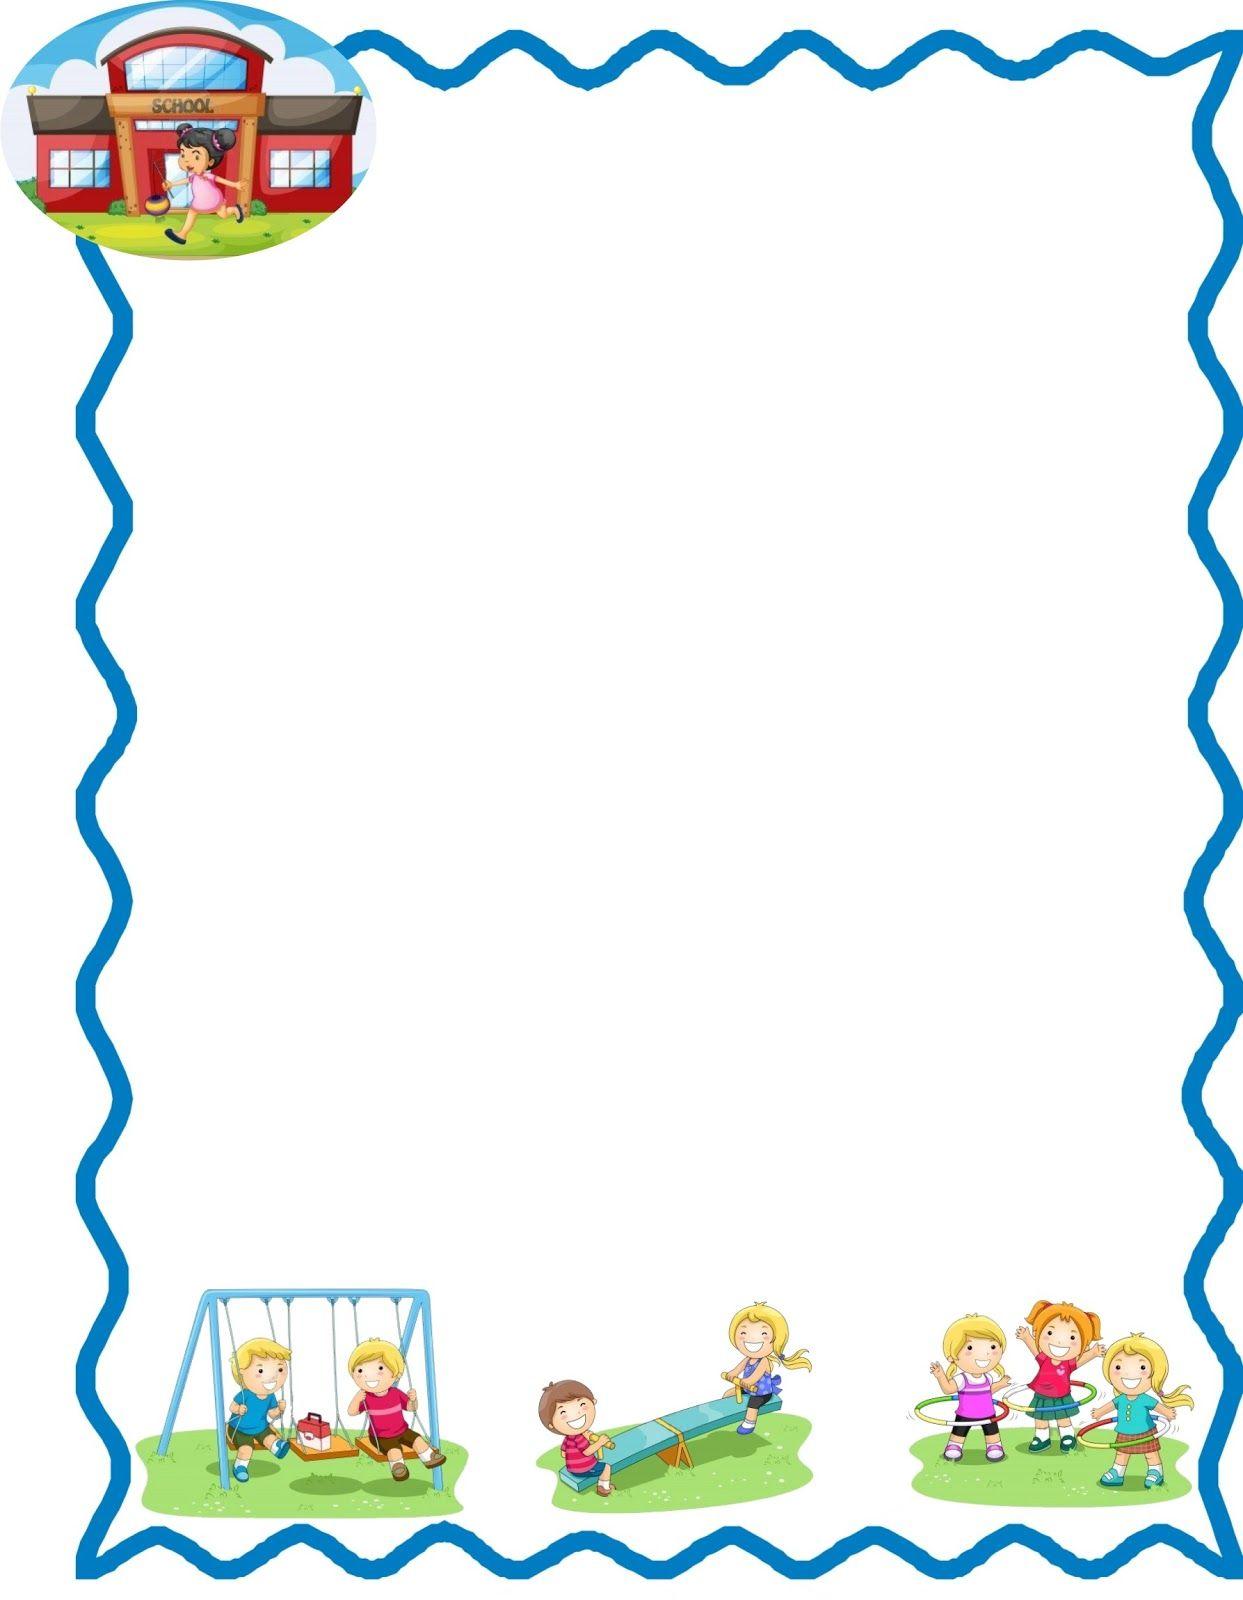 Marcos infantiles escolares para hojas imagui bordes for Paginas para hacer planos gratis